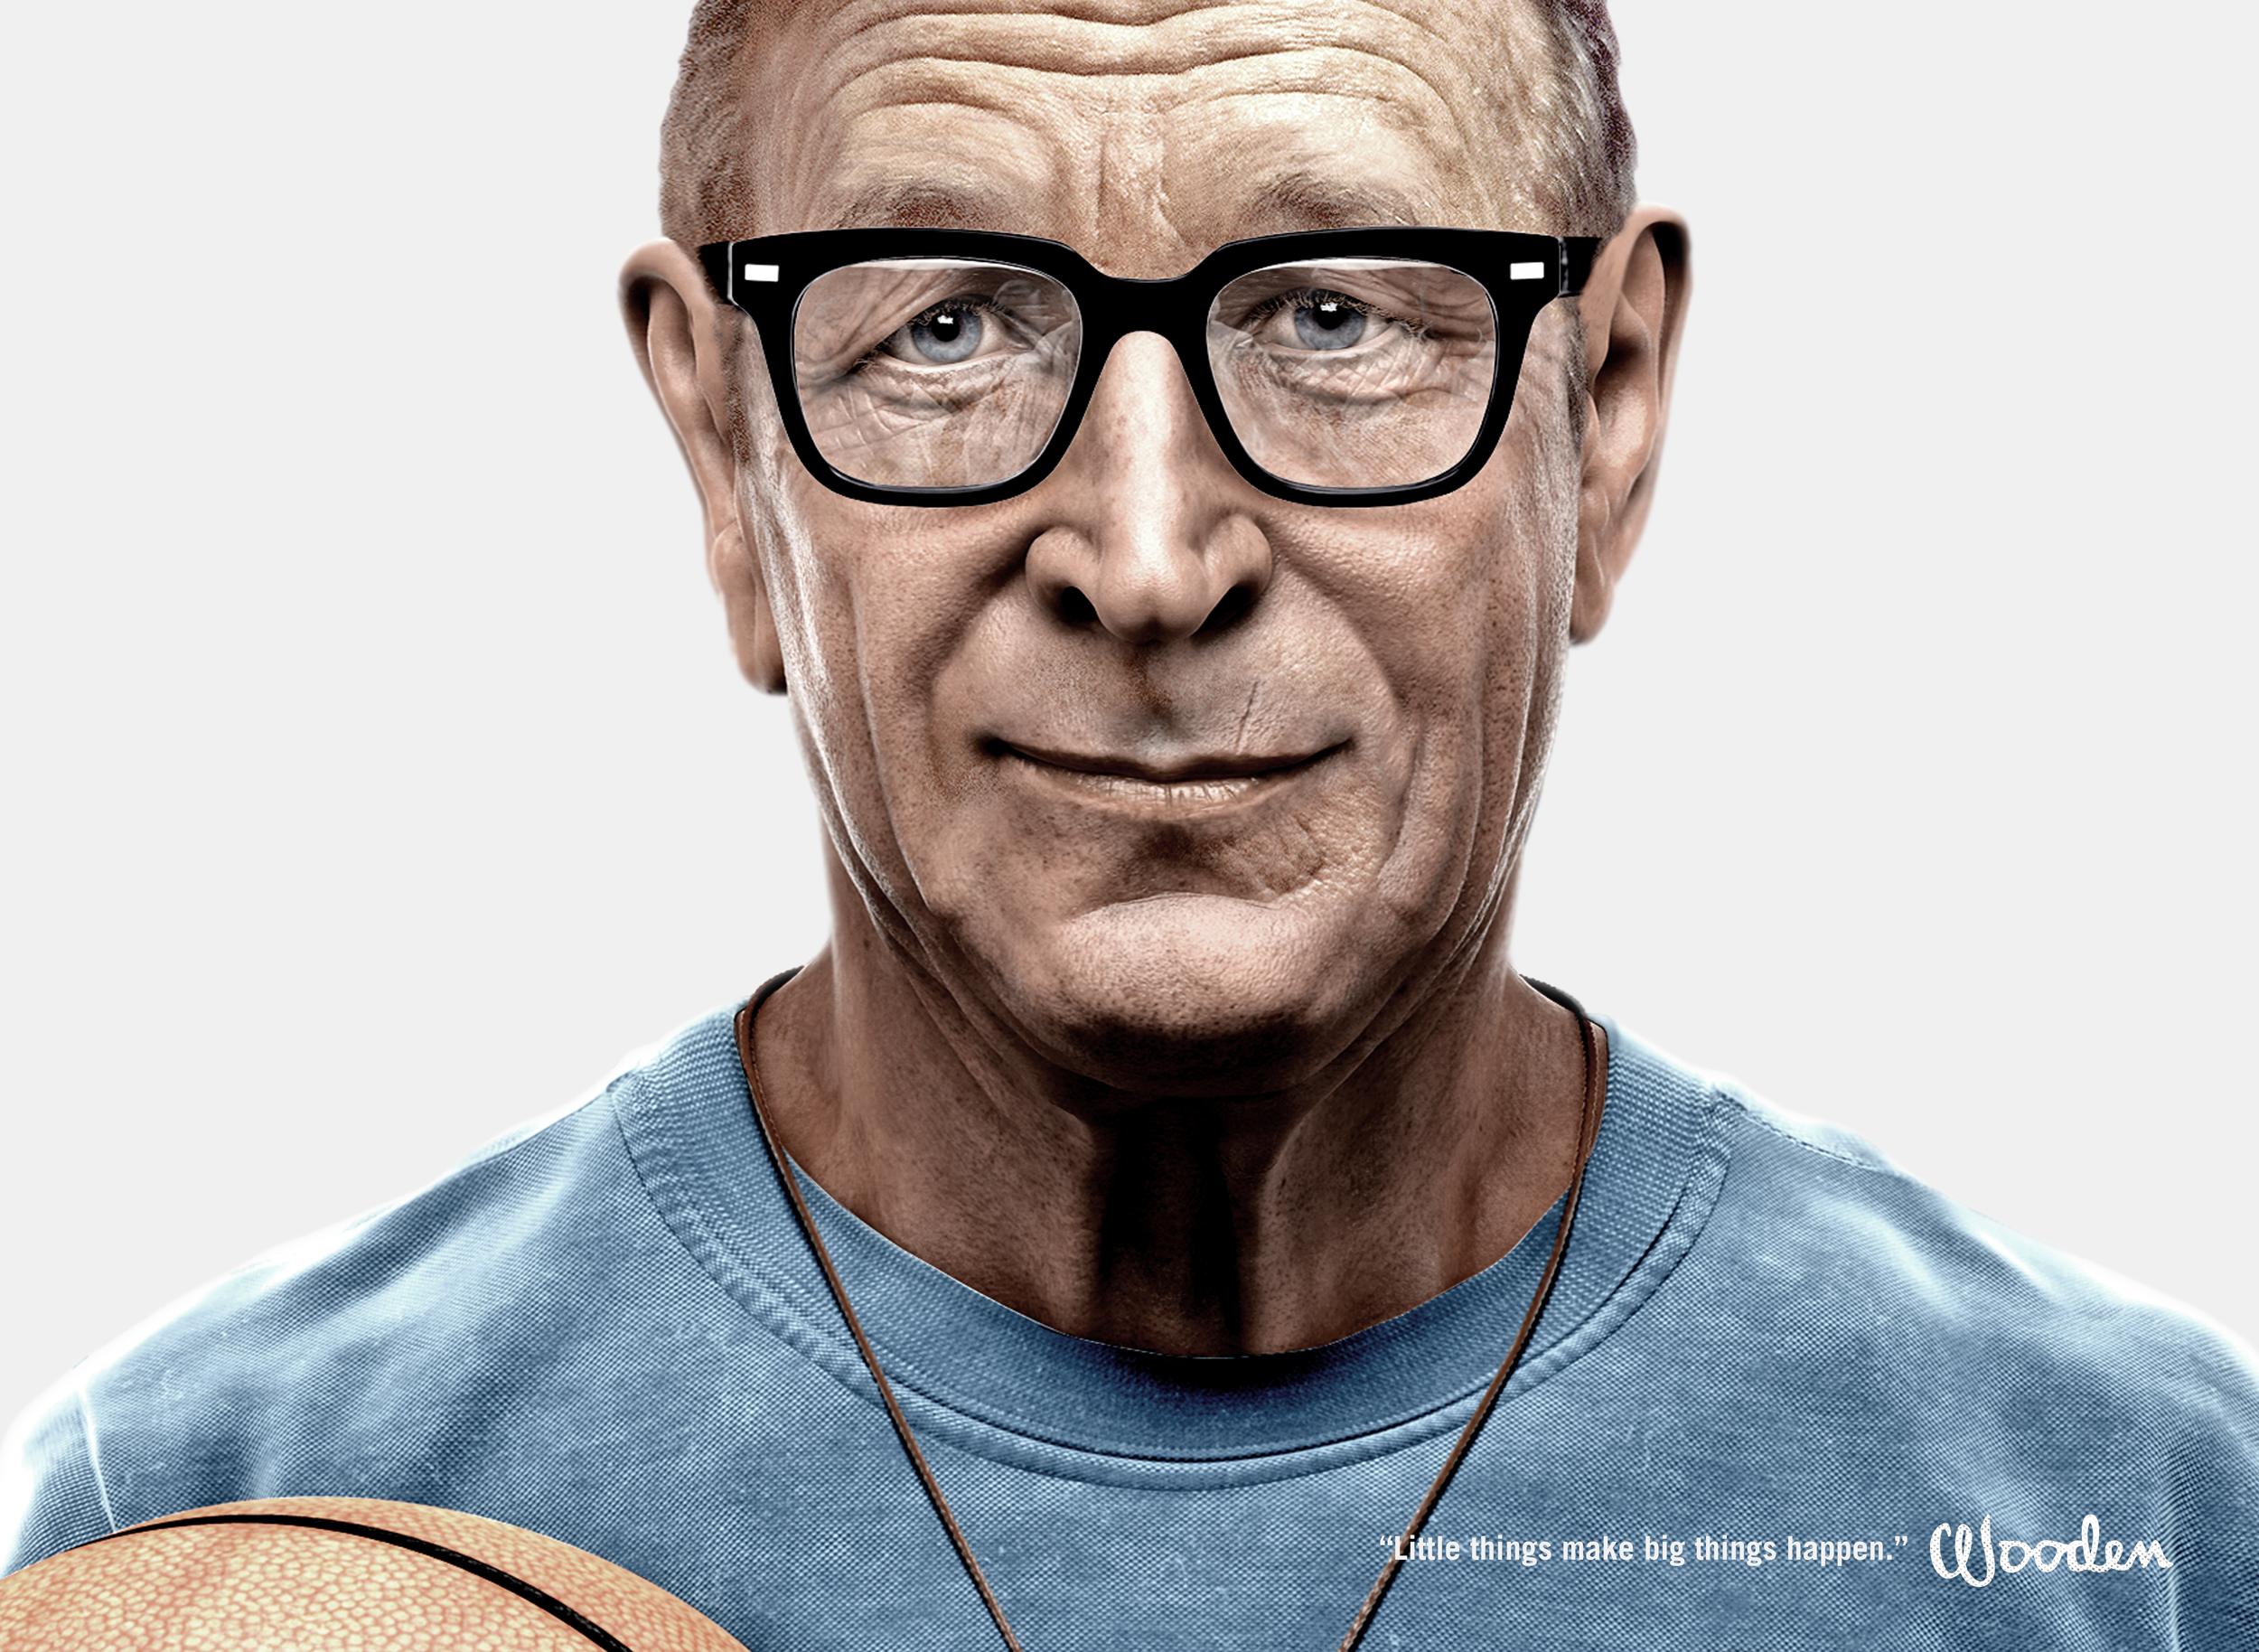 Fabled's 3D portrait of John Wooden